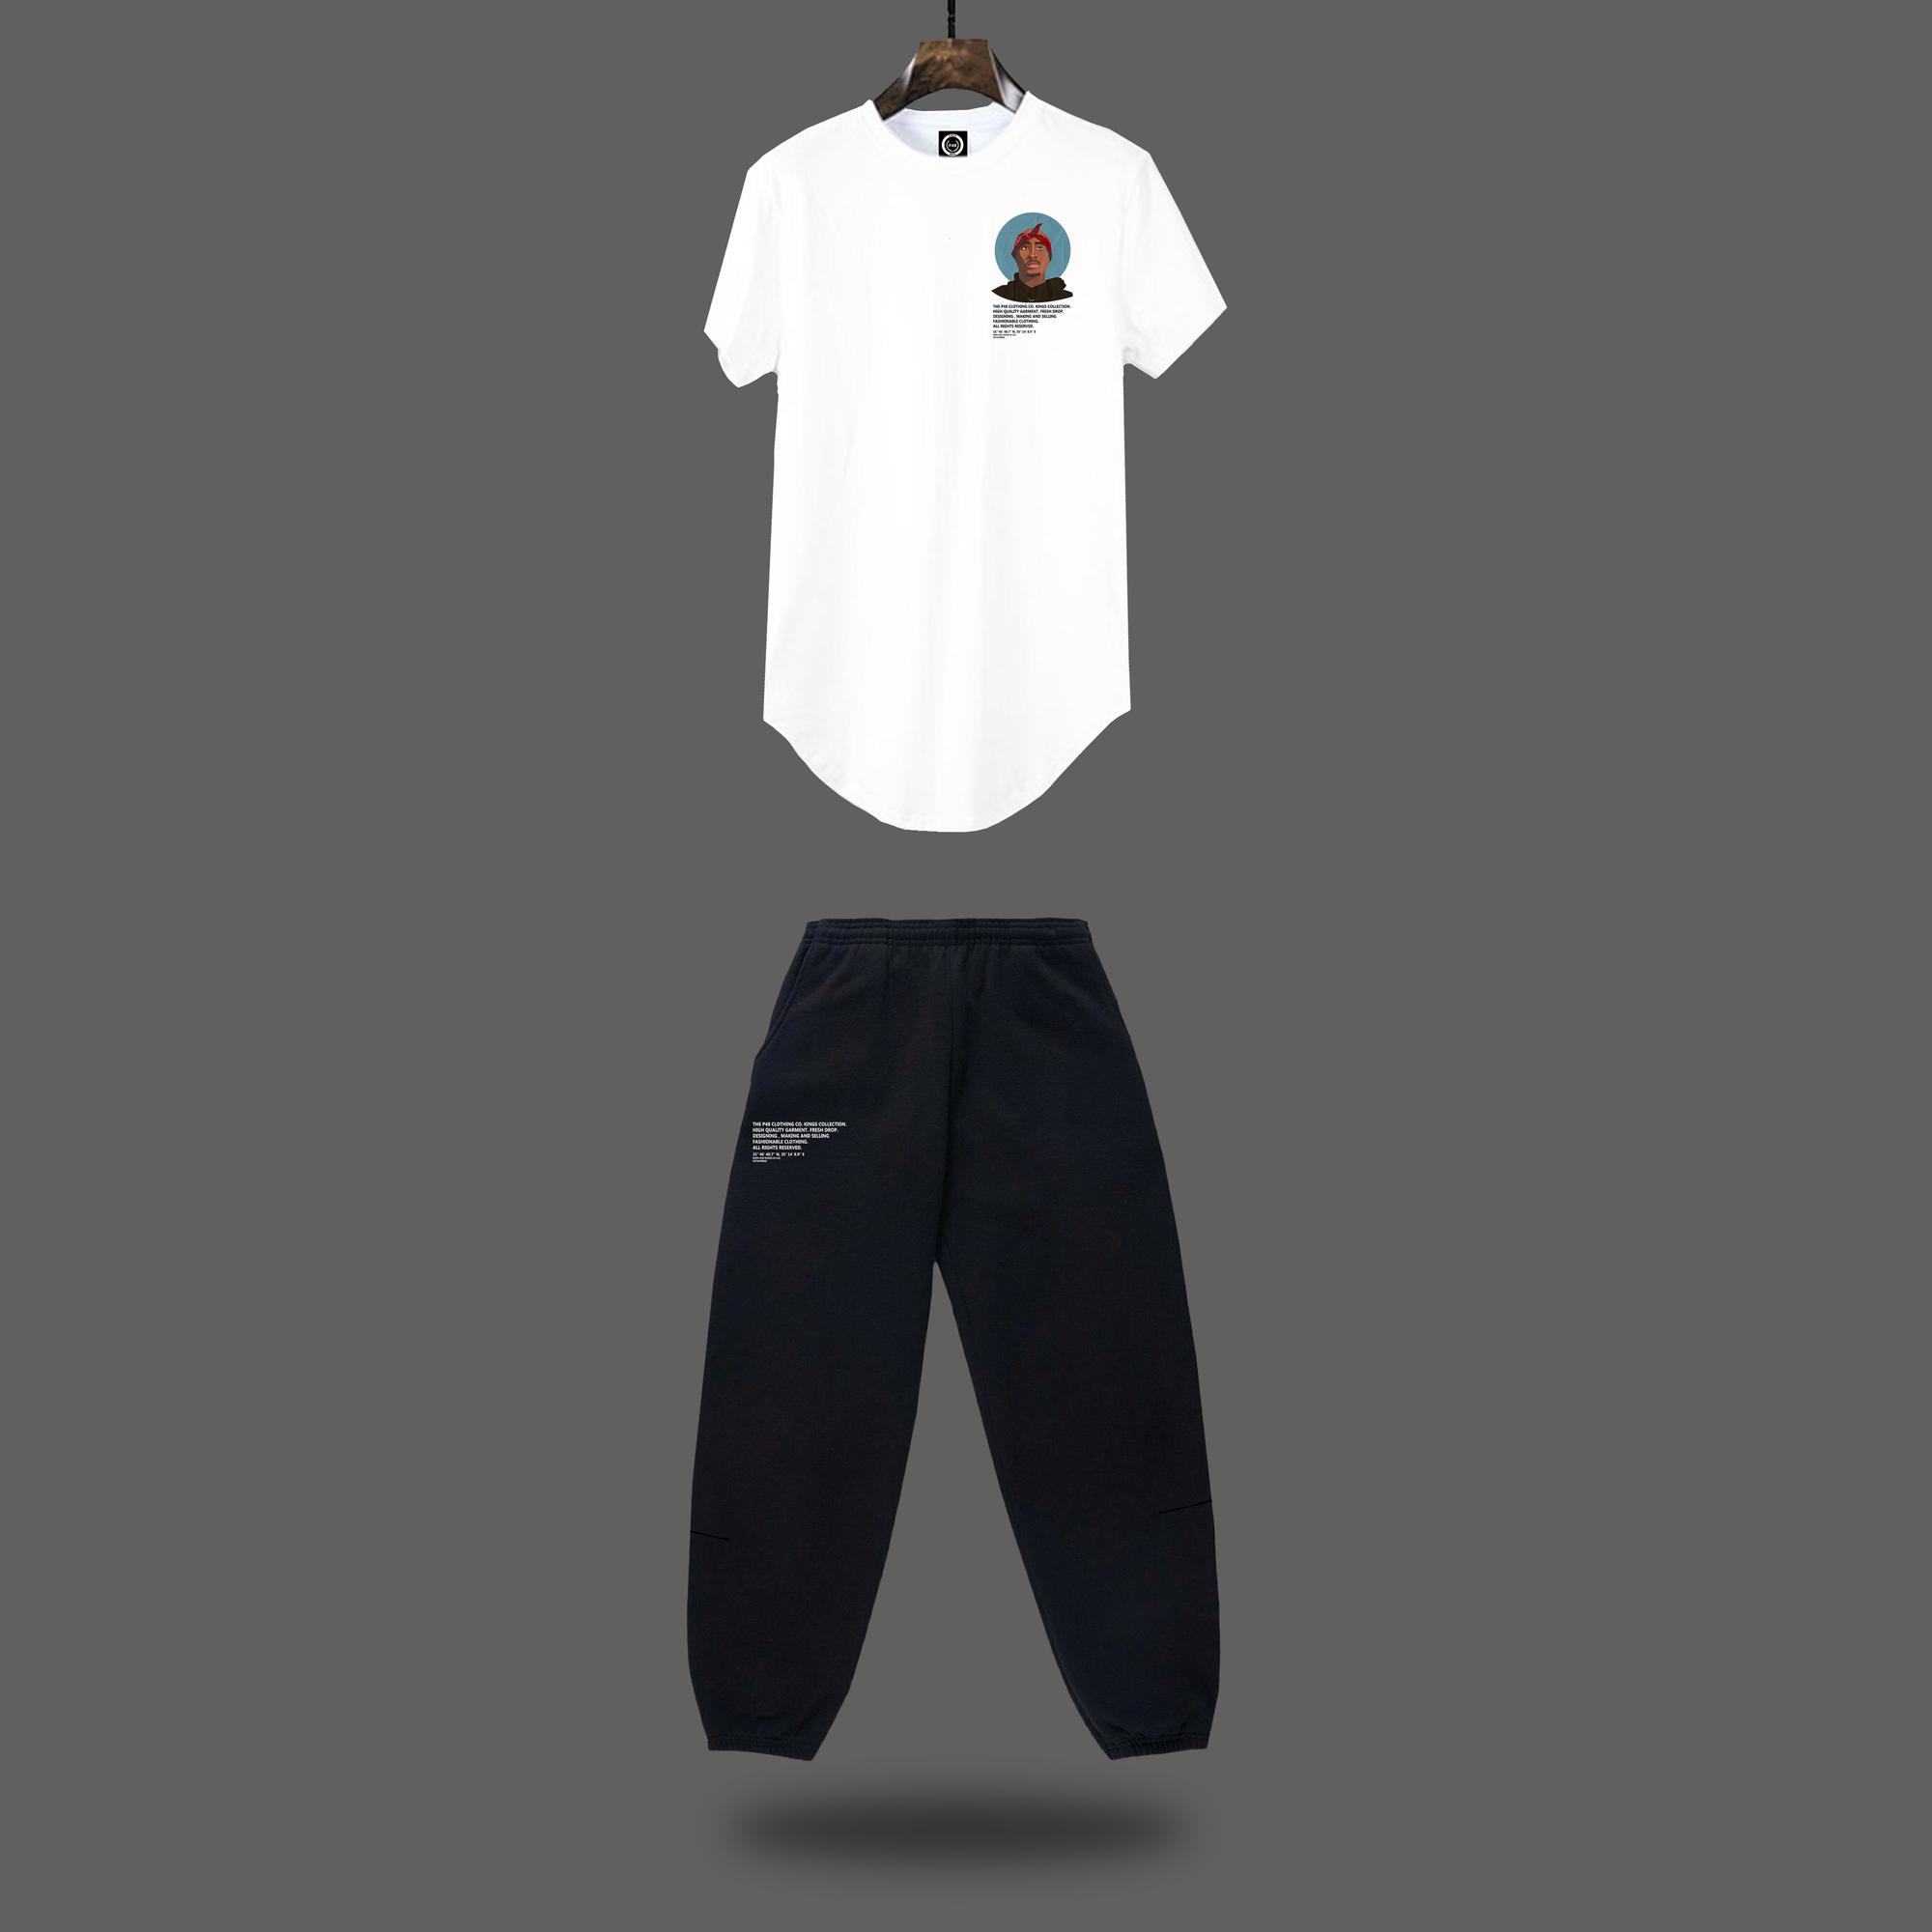 2pac set - Black & White